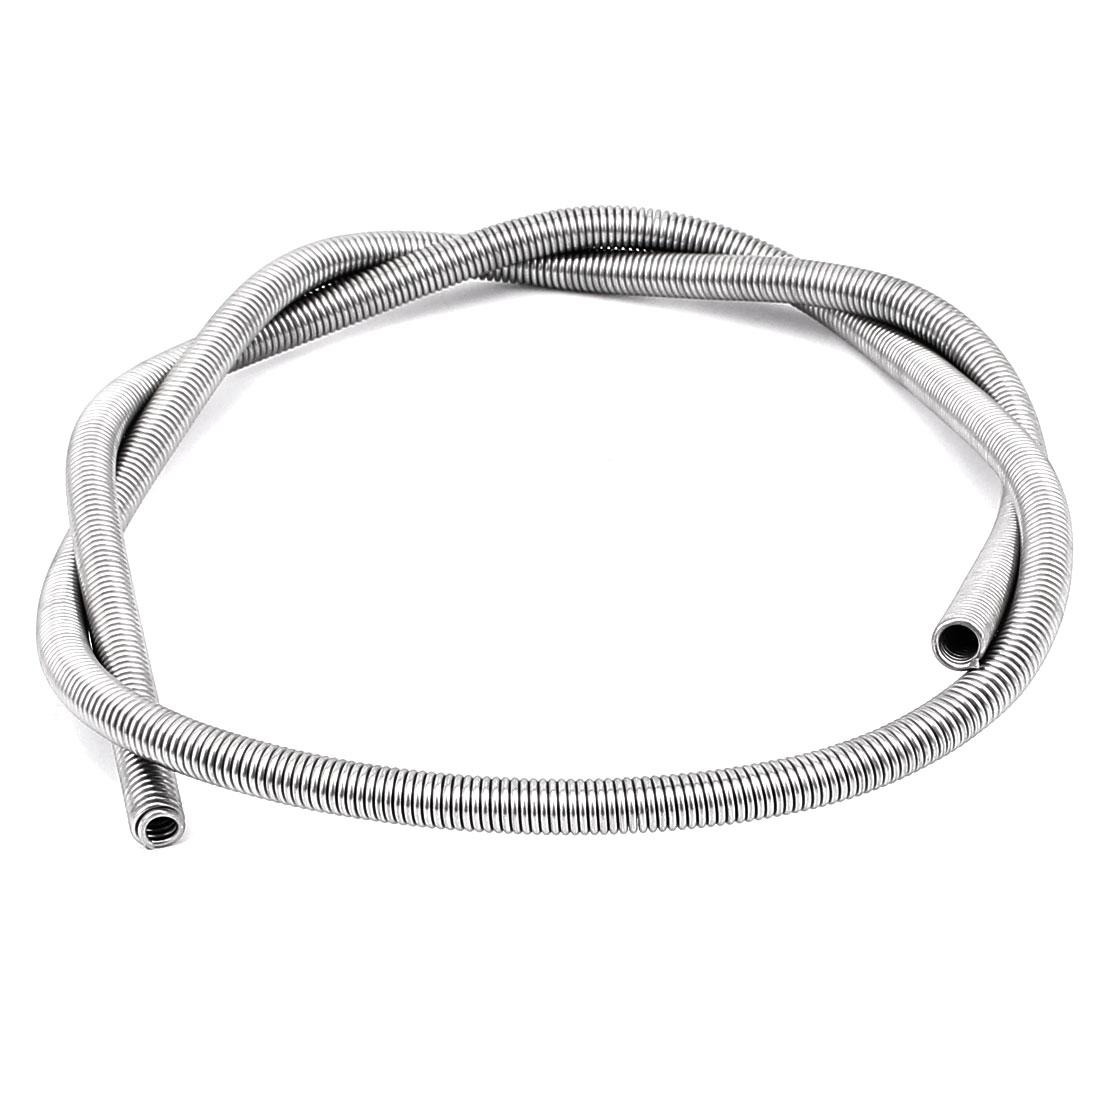 AC 220V 2500W Kiln Furnace Heater Heat Element Wire Coil 73cm Long